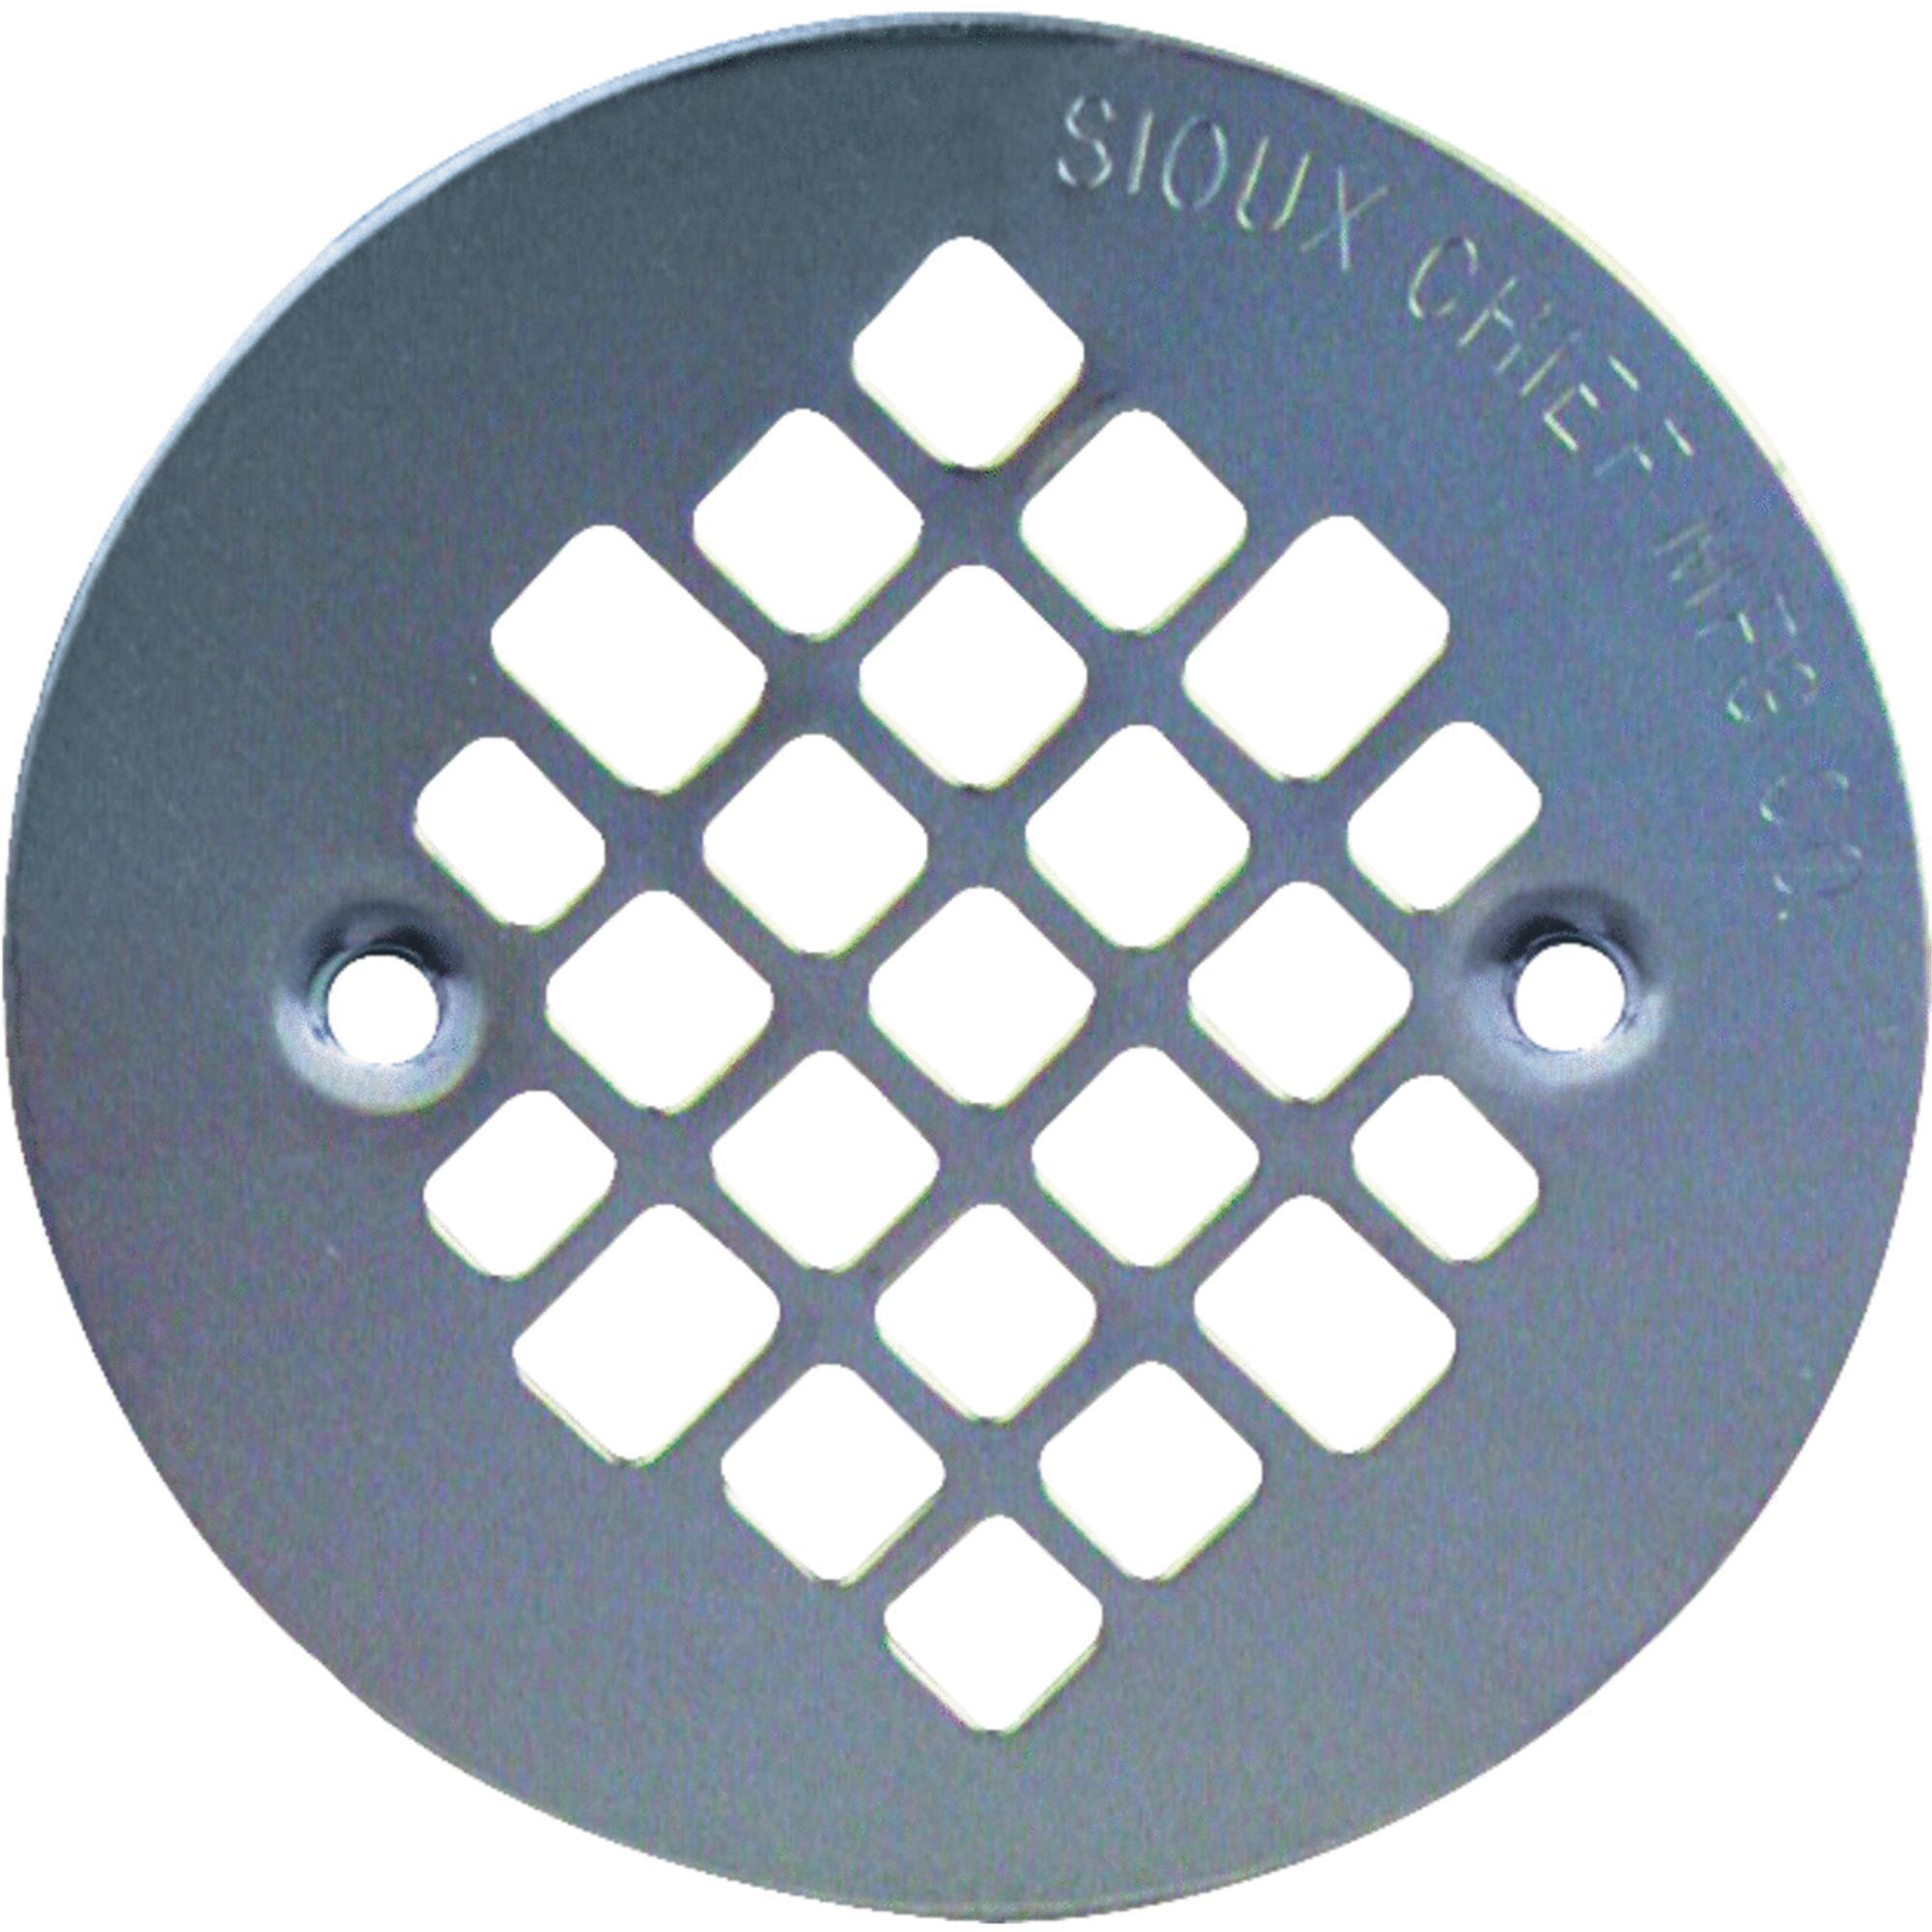 Sioux Chief 4-1/4 Stainless Steel Shower Strainer 821-2SPK1